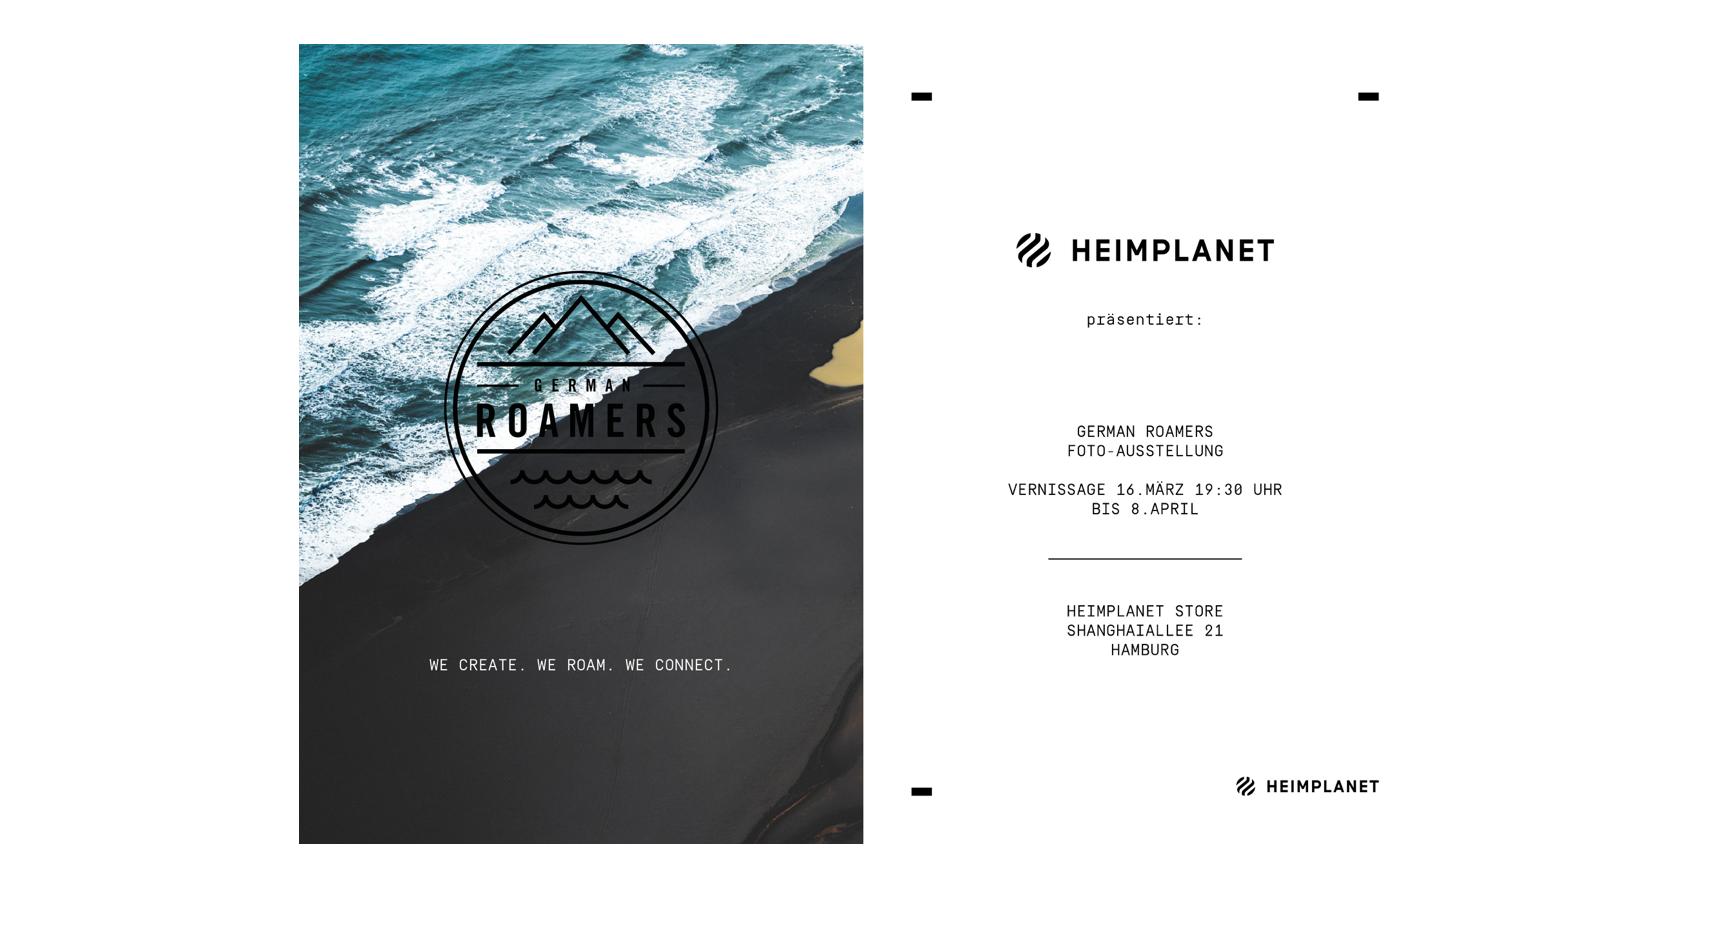 HEIMPLANET X GERMANroamers